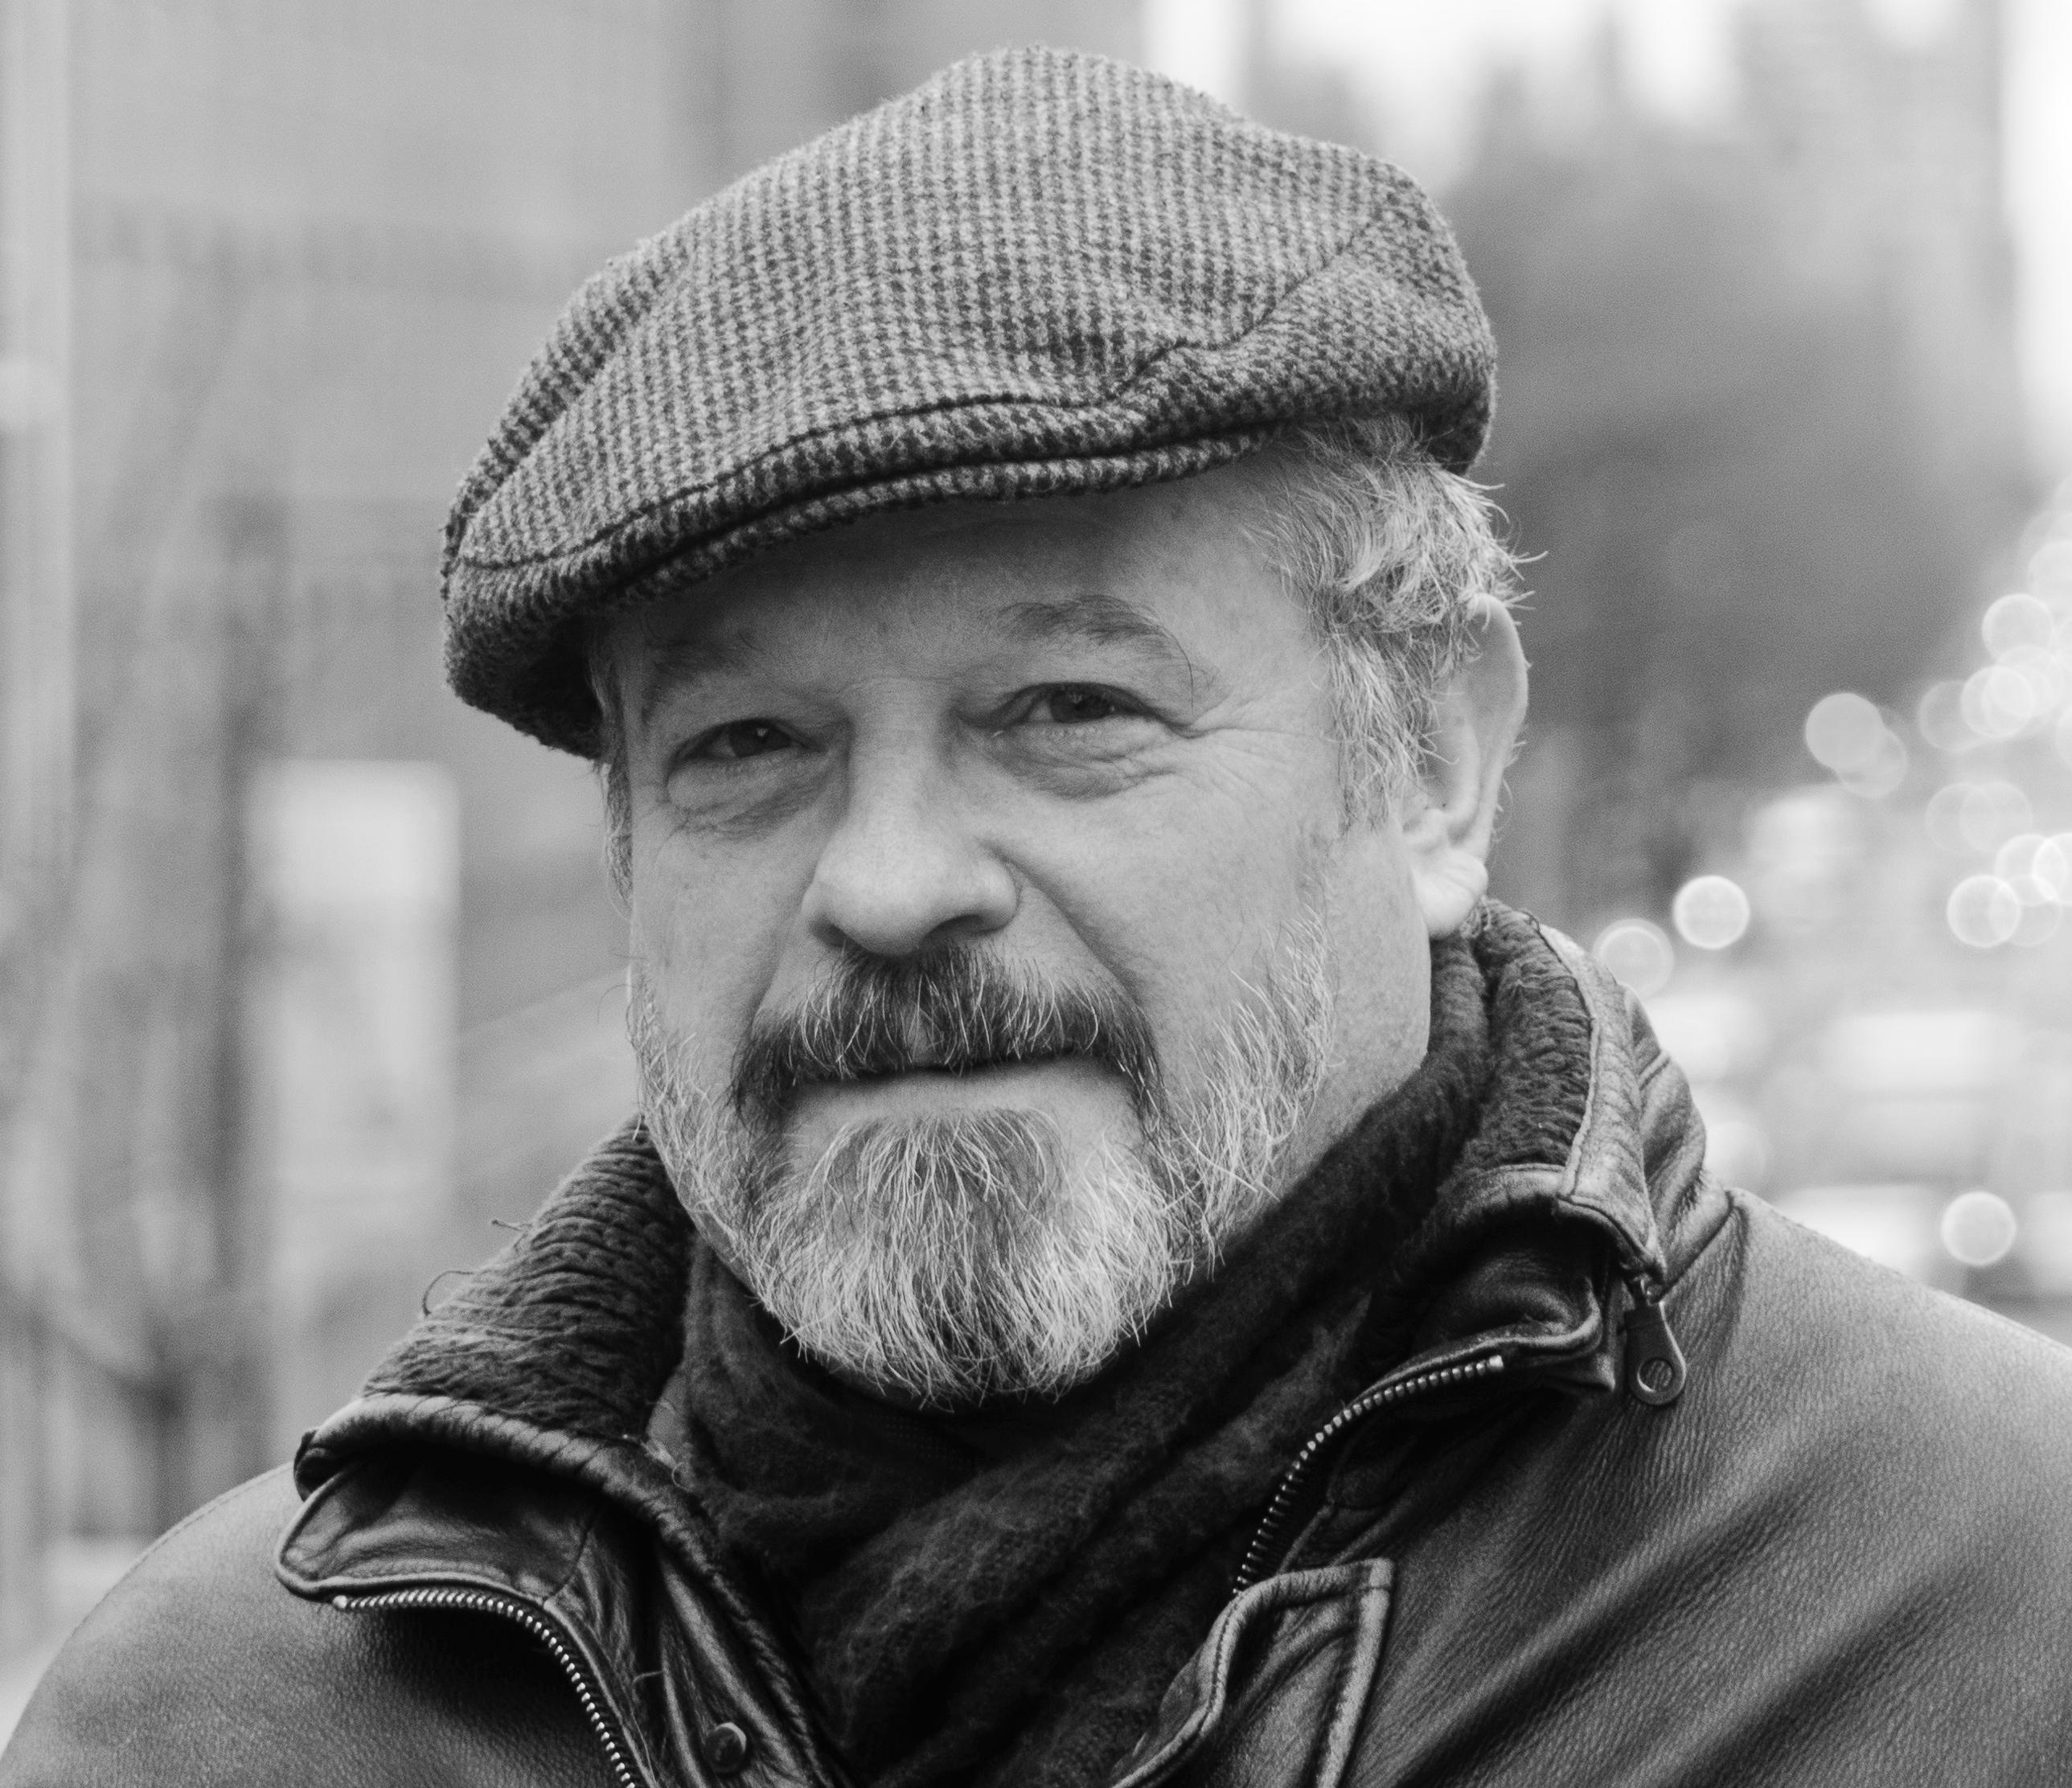 Peter Wortsman (© Ricky Owens)